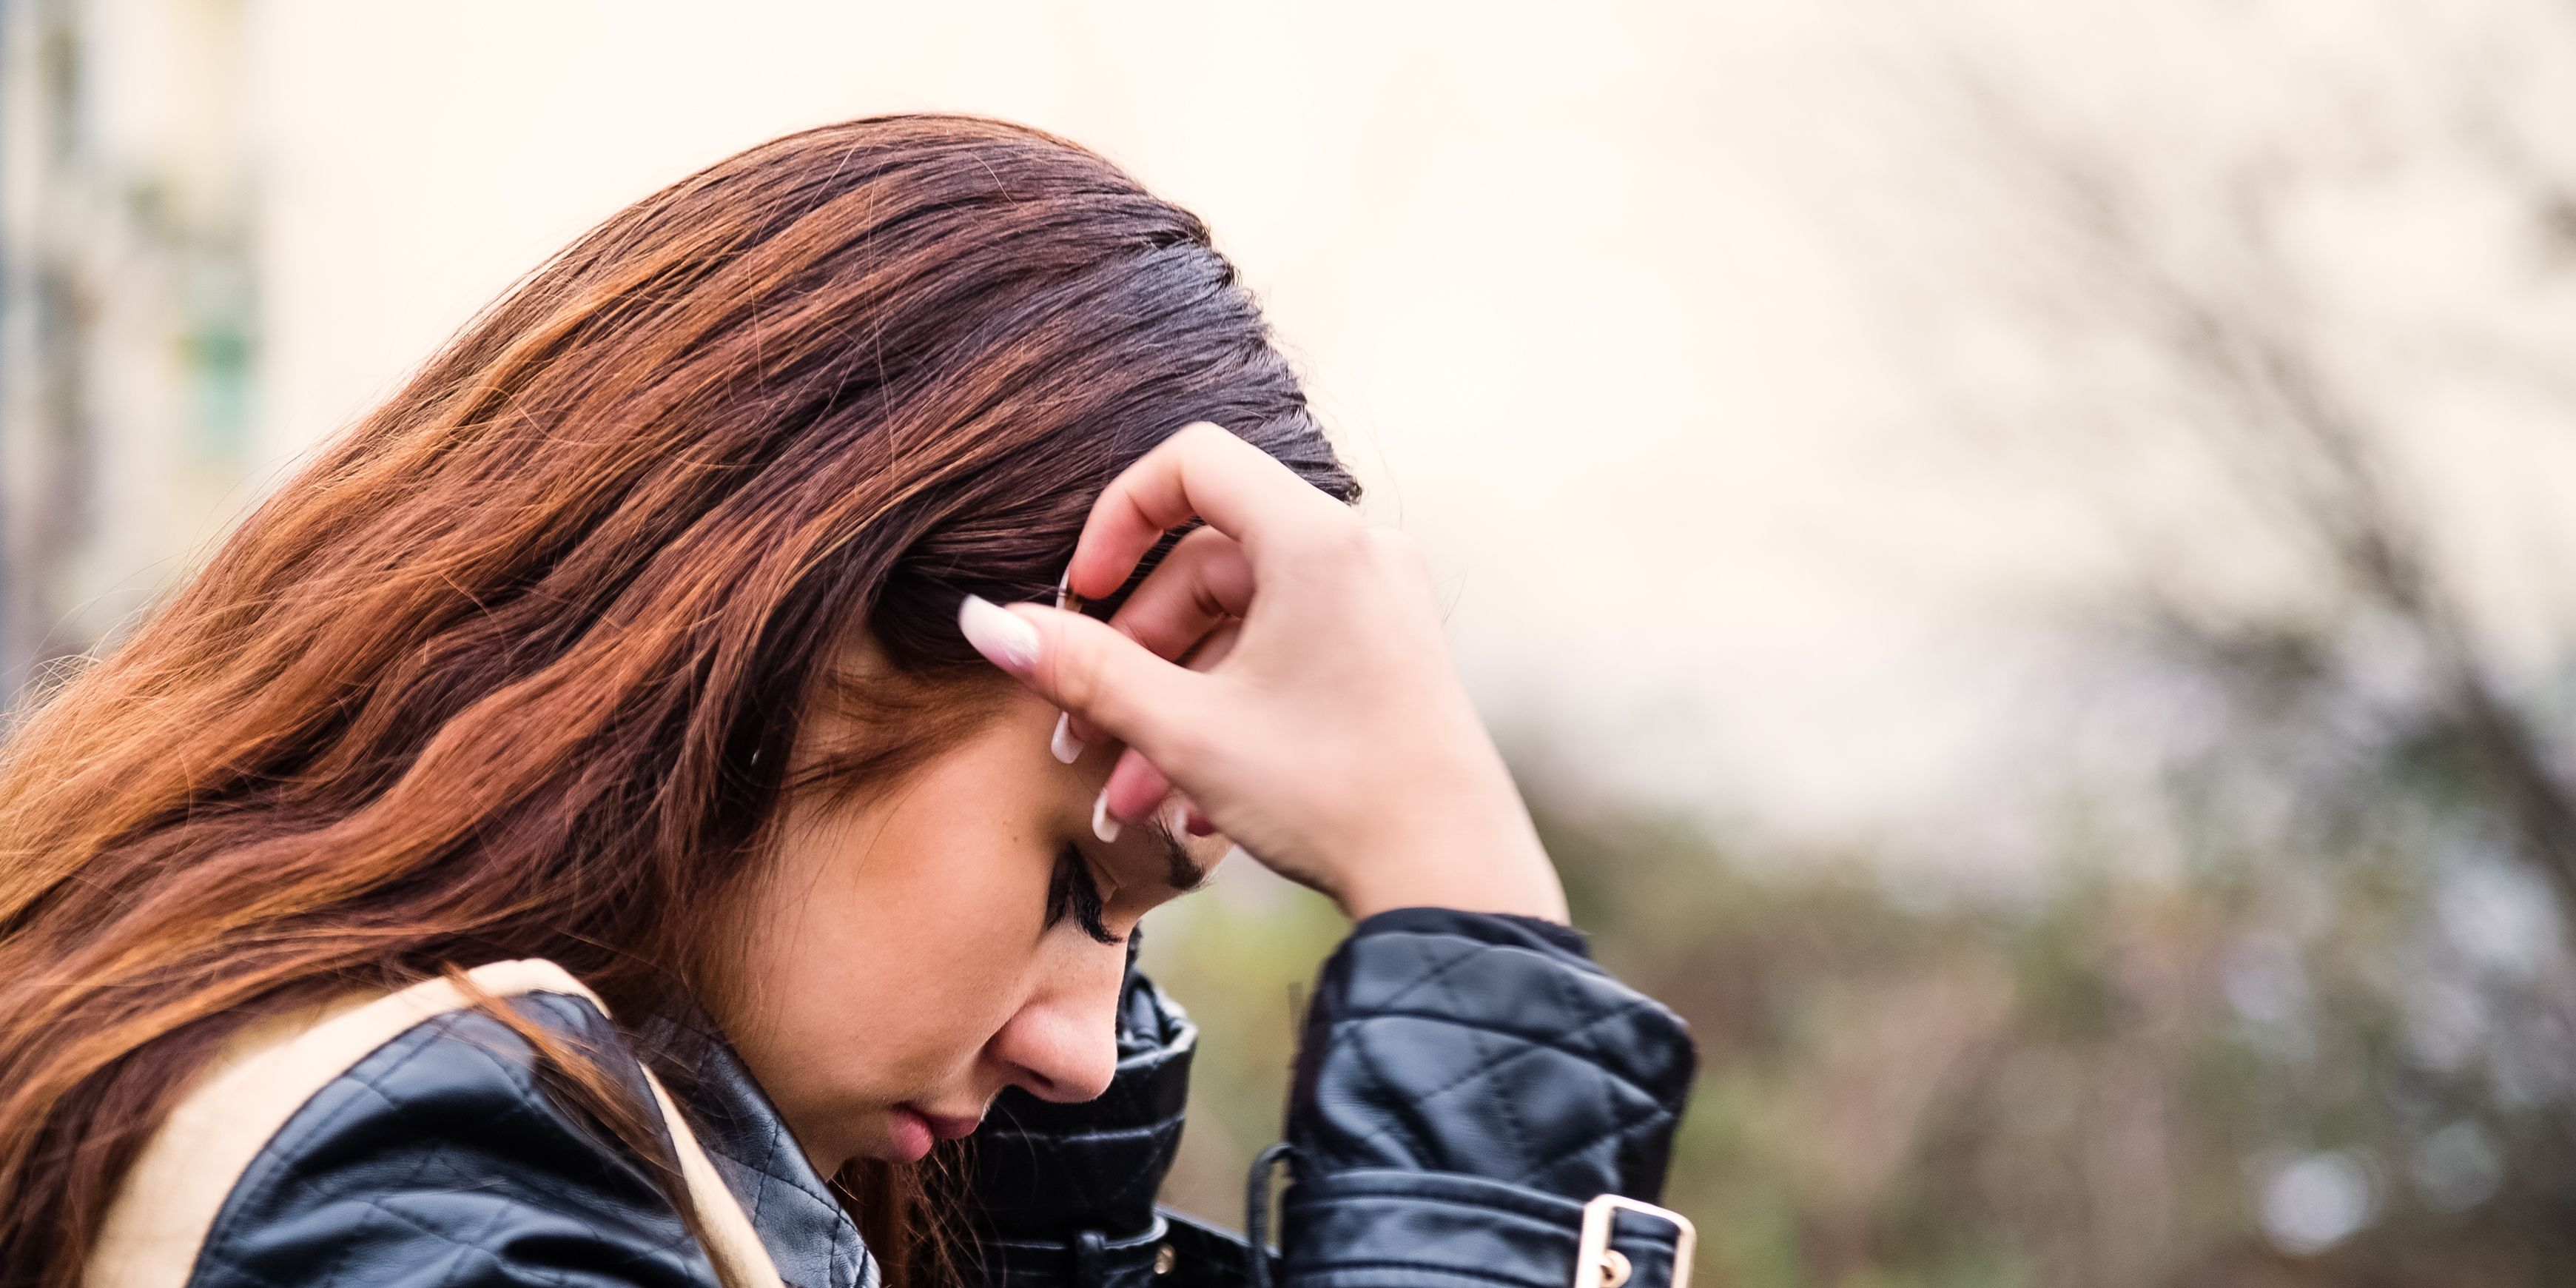 acne verhoogt kans op depressie